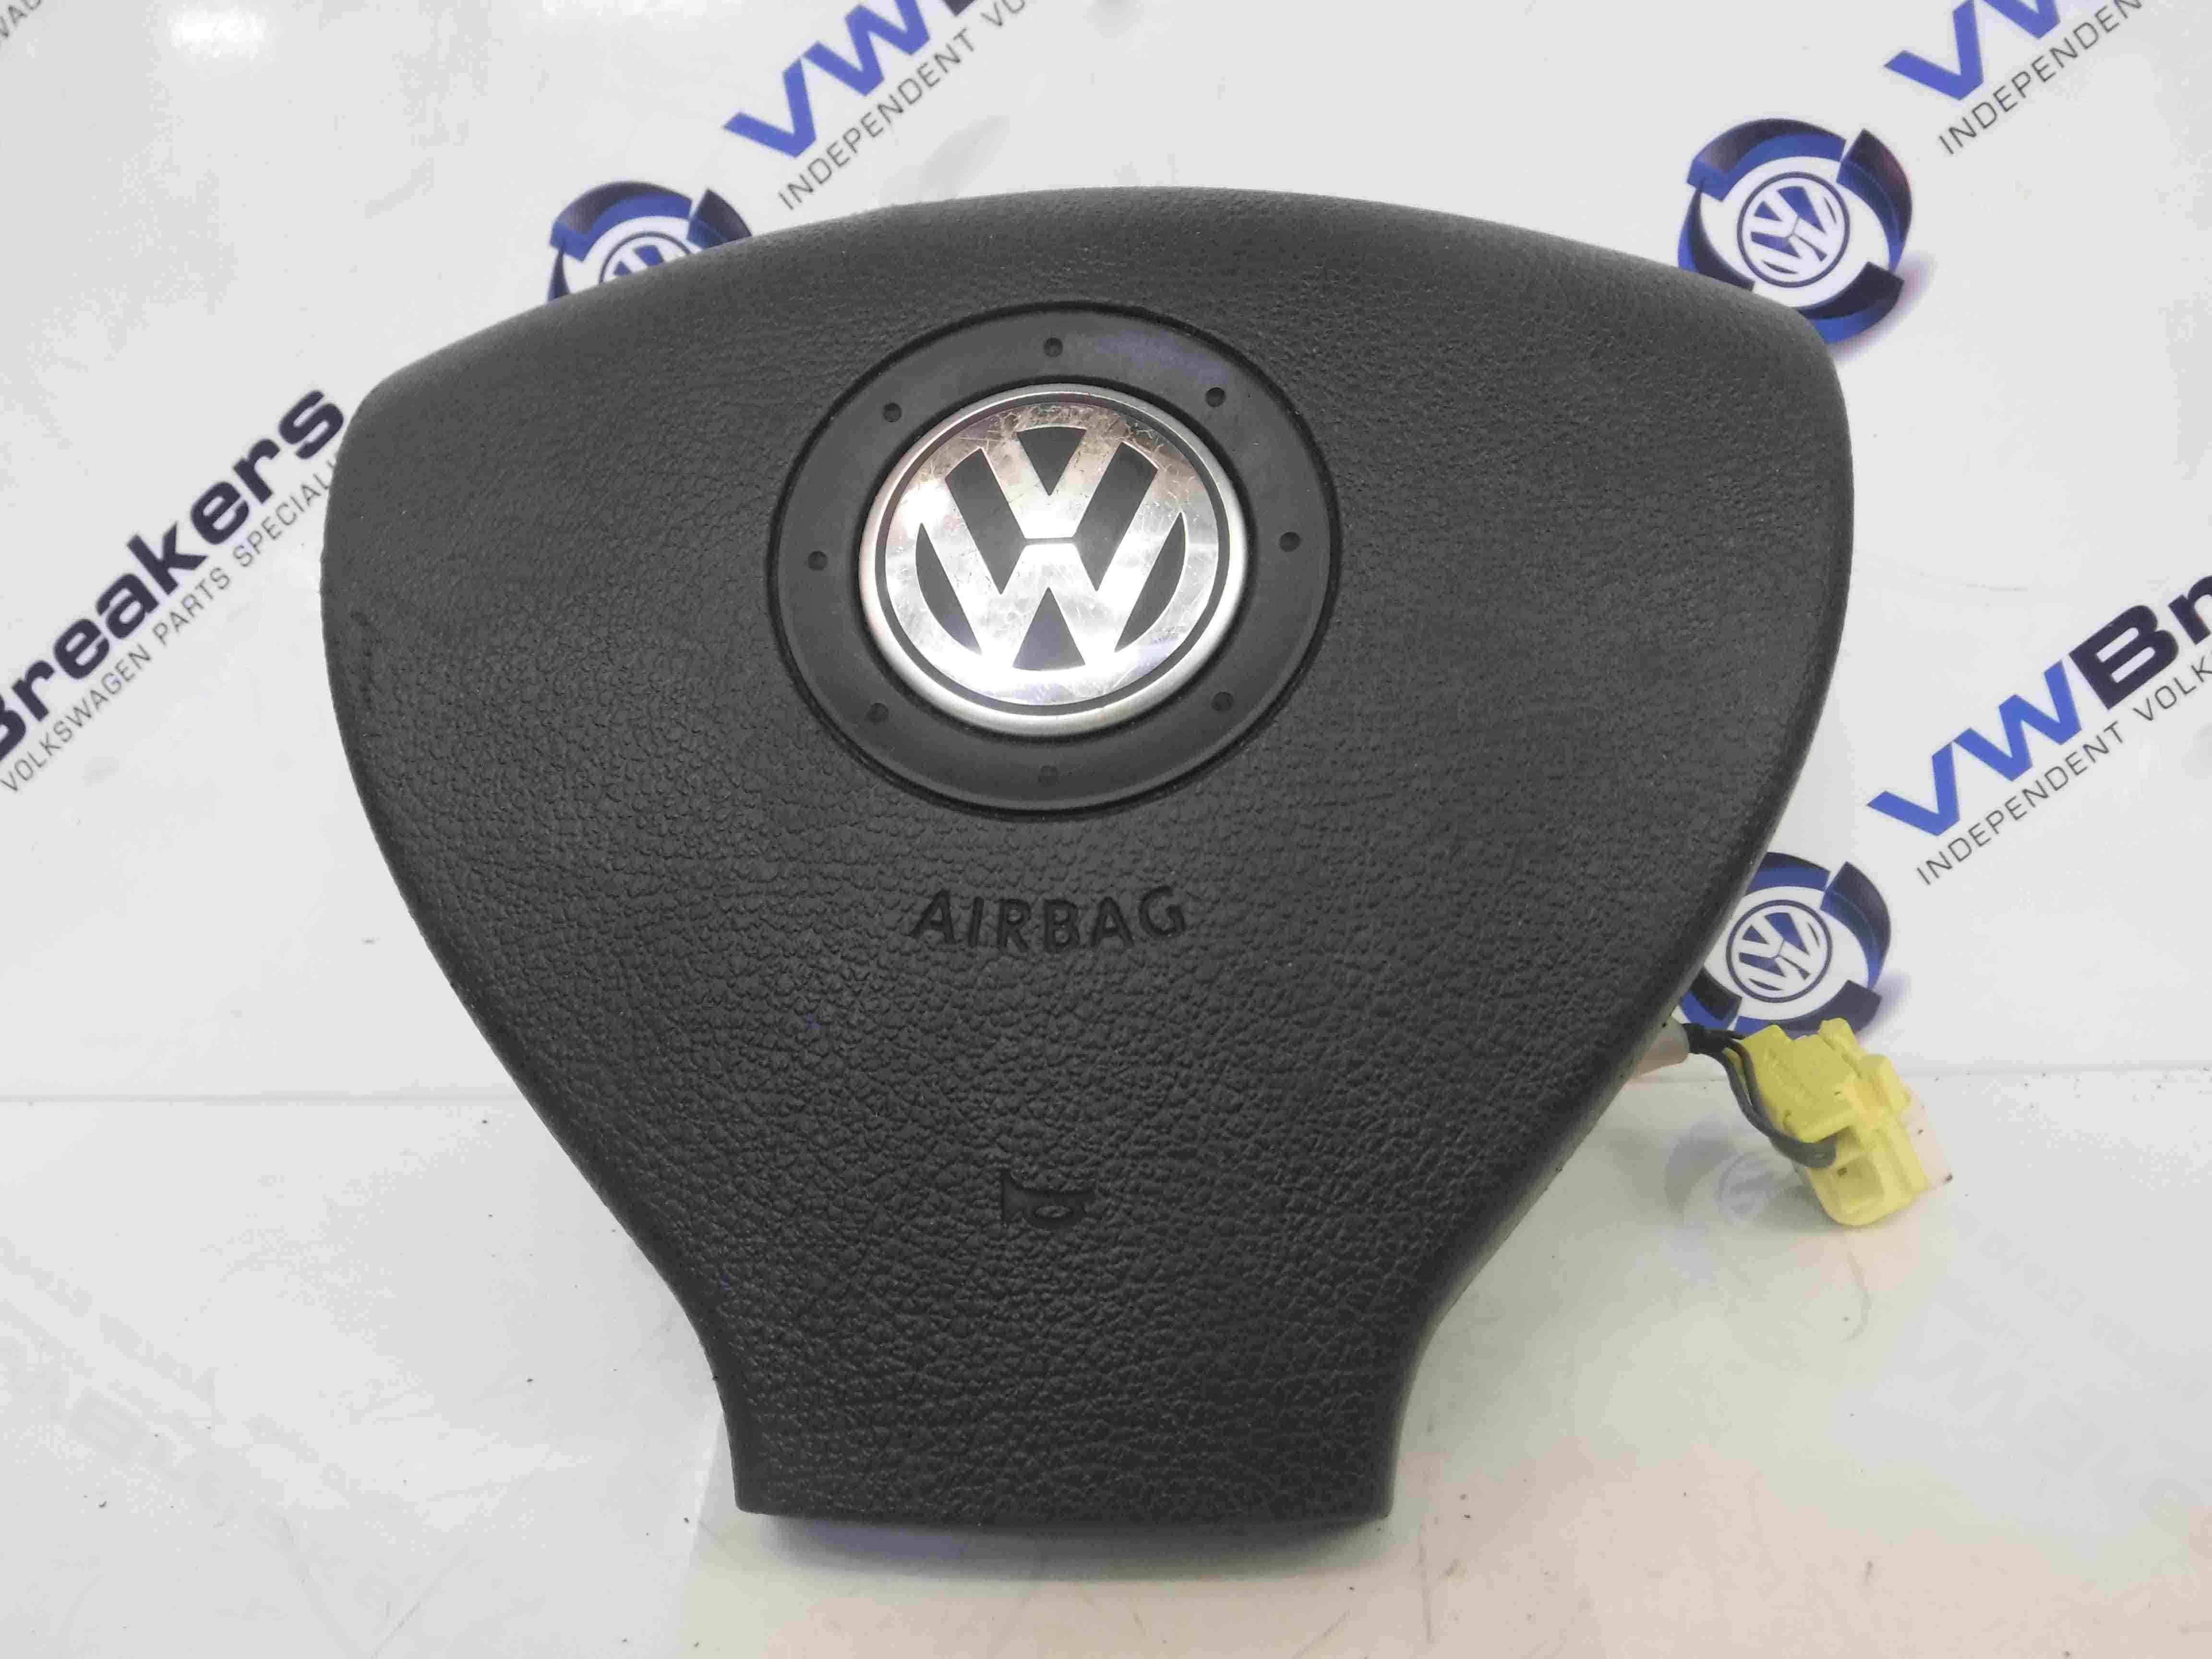 Volkswagen Golf MK5 2003-2009 Steering Wheel Airbag 1K0880201P SEE CONDITION